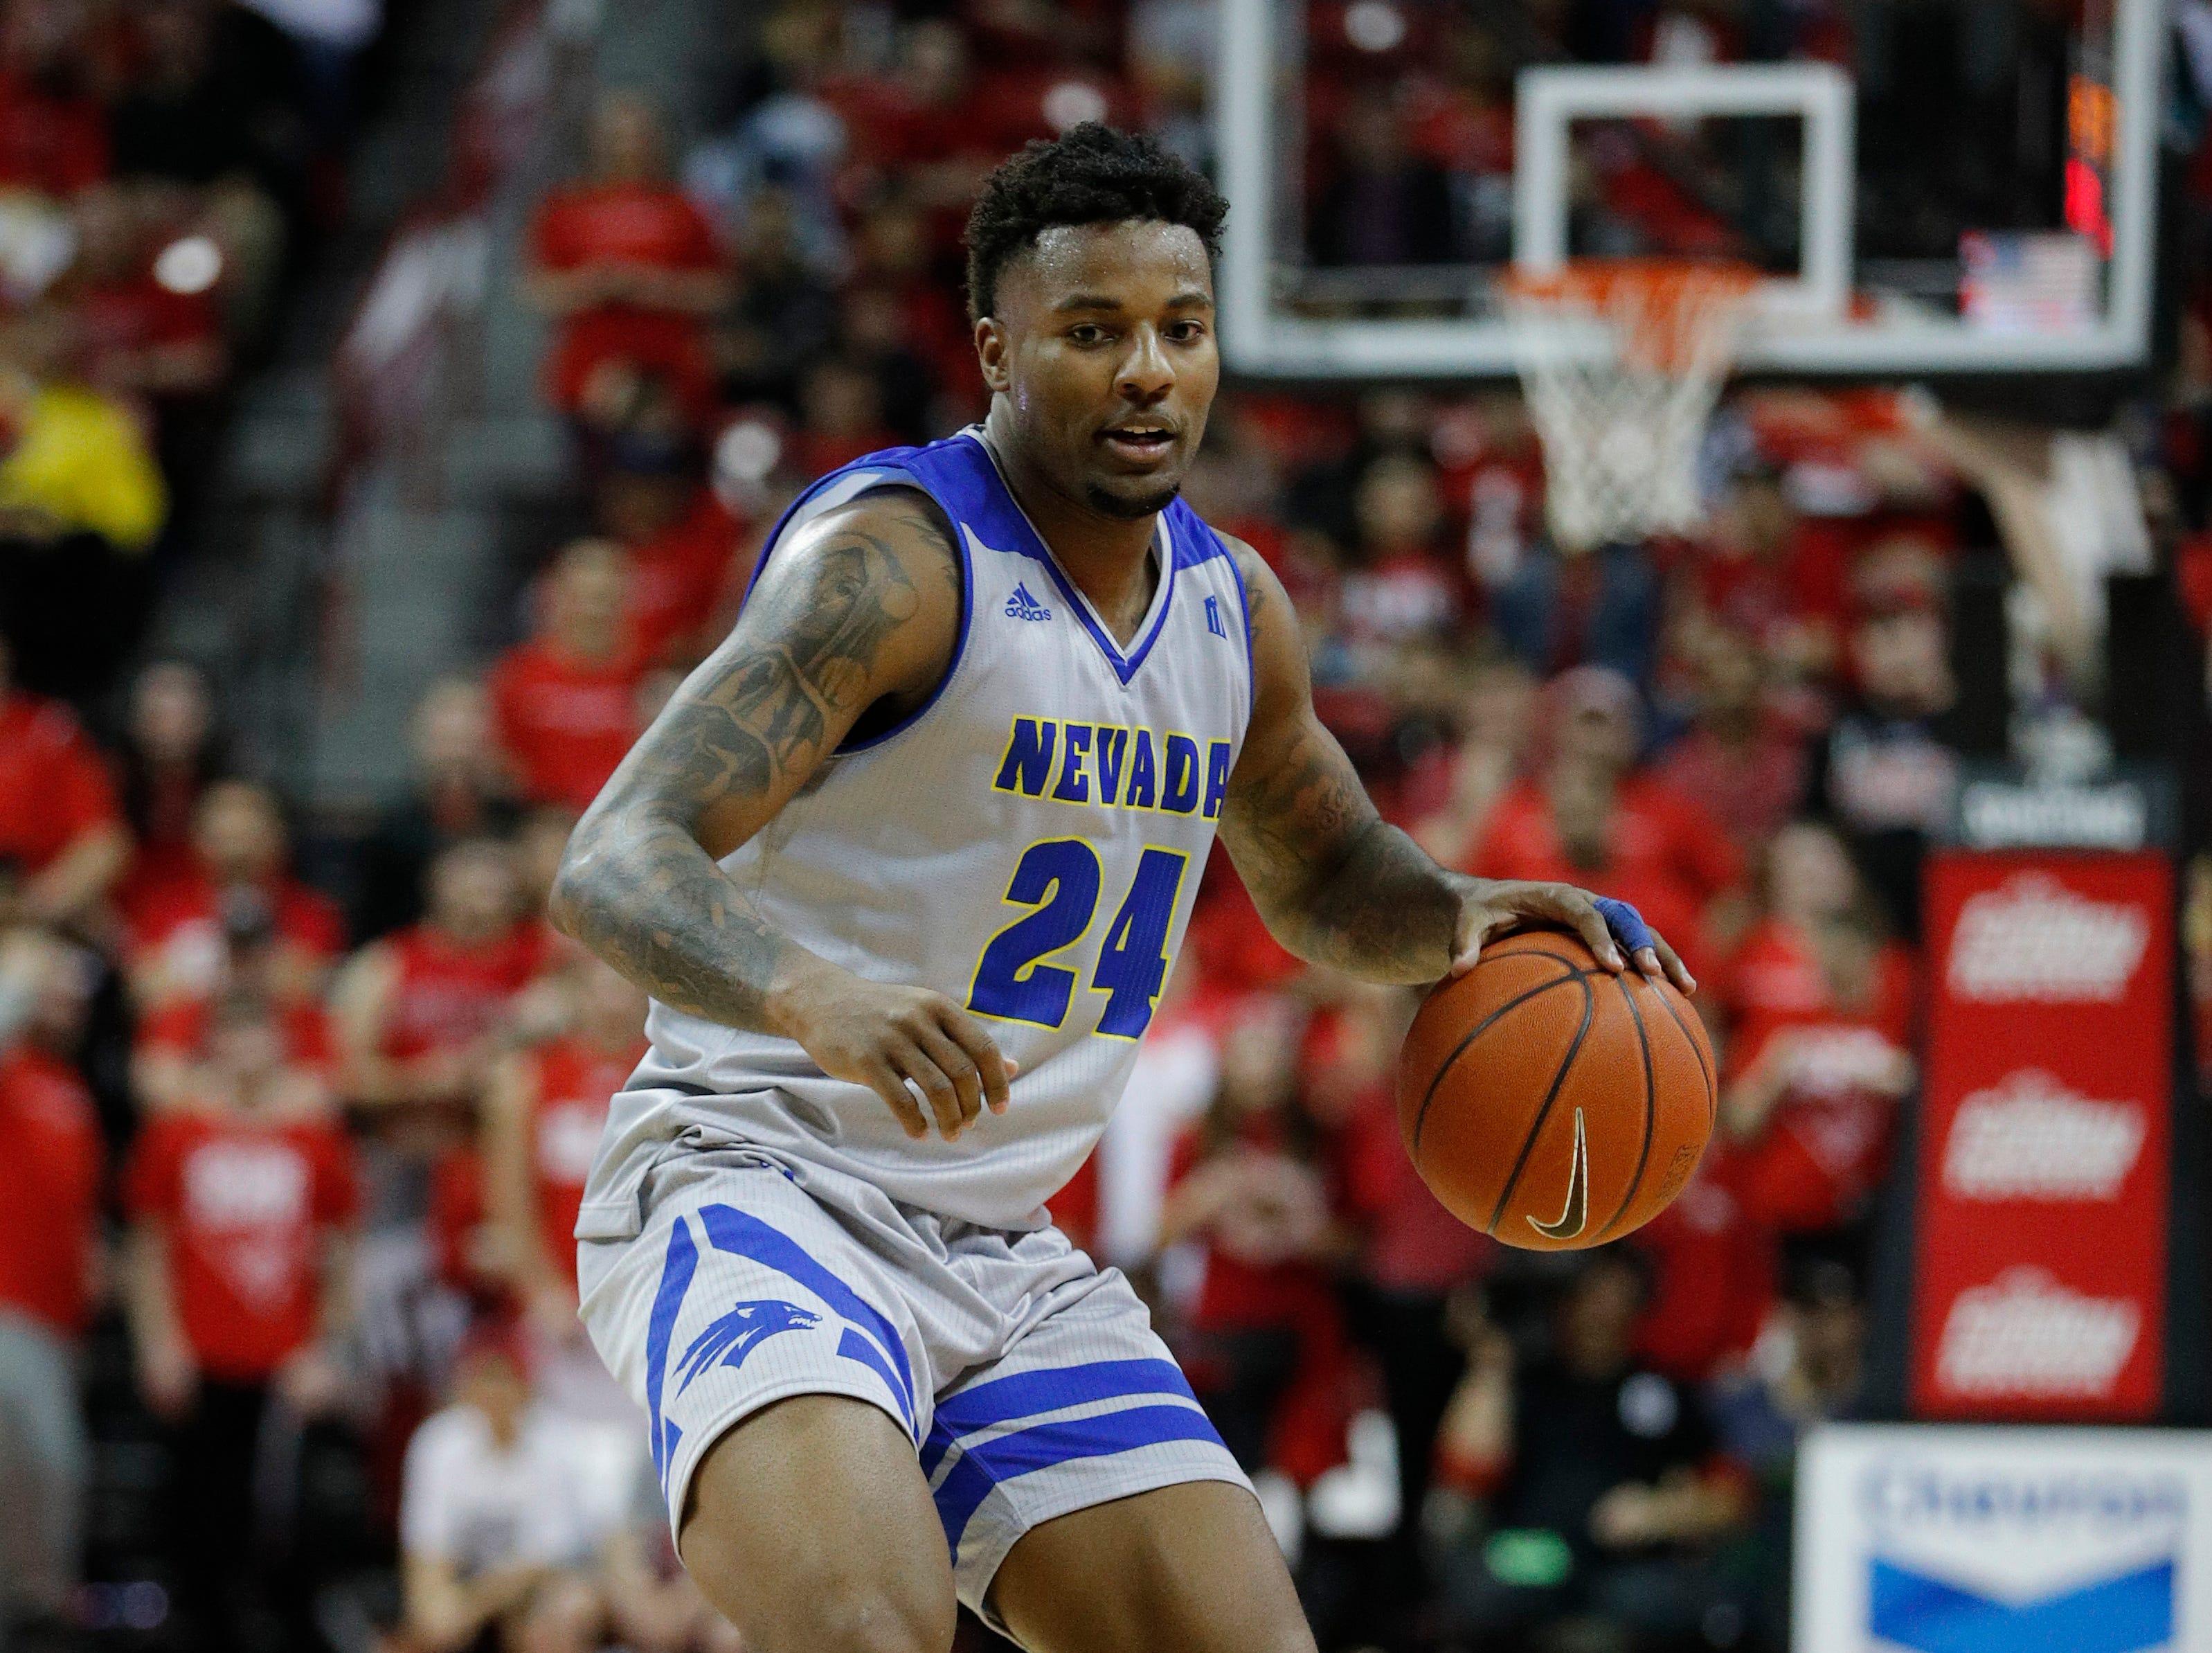 Nevada's Jordan Caroline (24) plays against UNLV during the second half of an NCAA college basketball game Tuesday, Jan. 29, 2019, in Las Vegas. Nevada won 87-70. (AP Photo/John Locher)